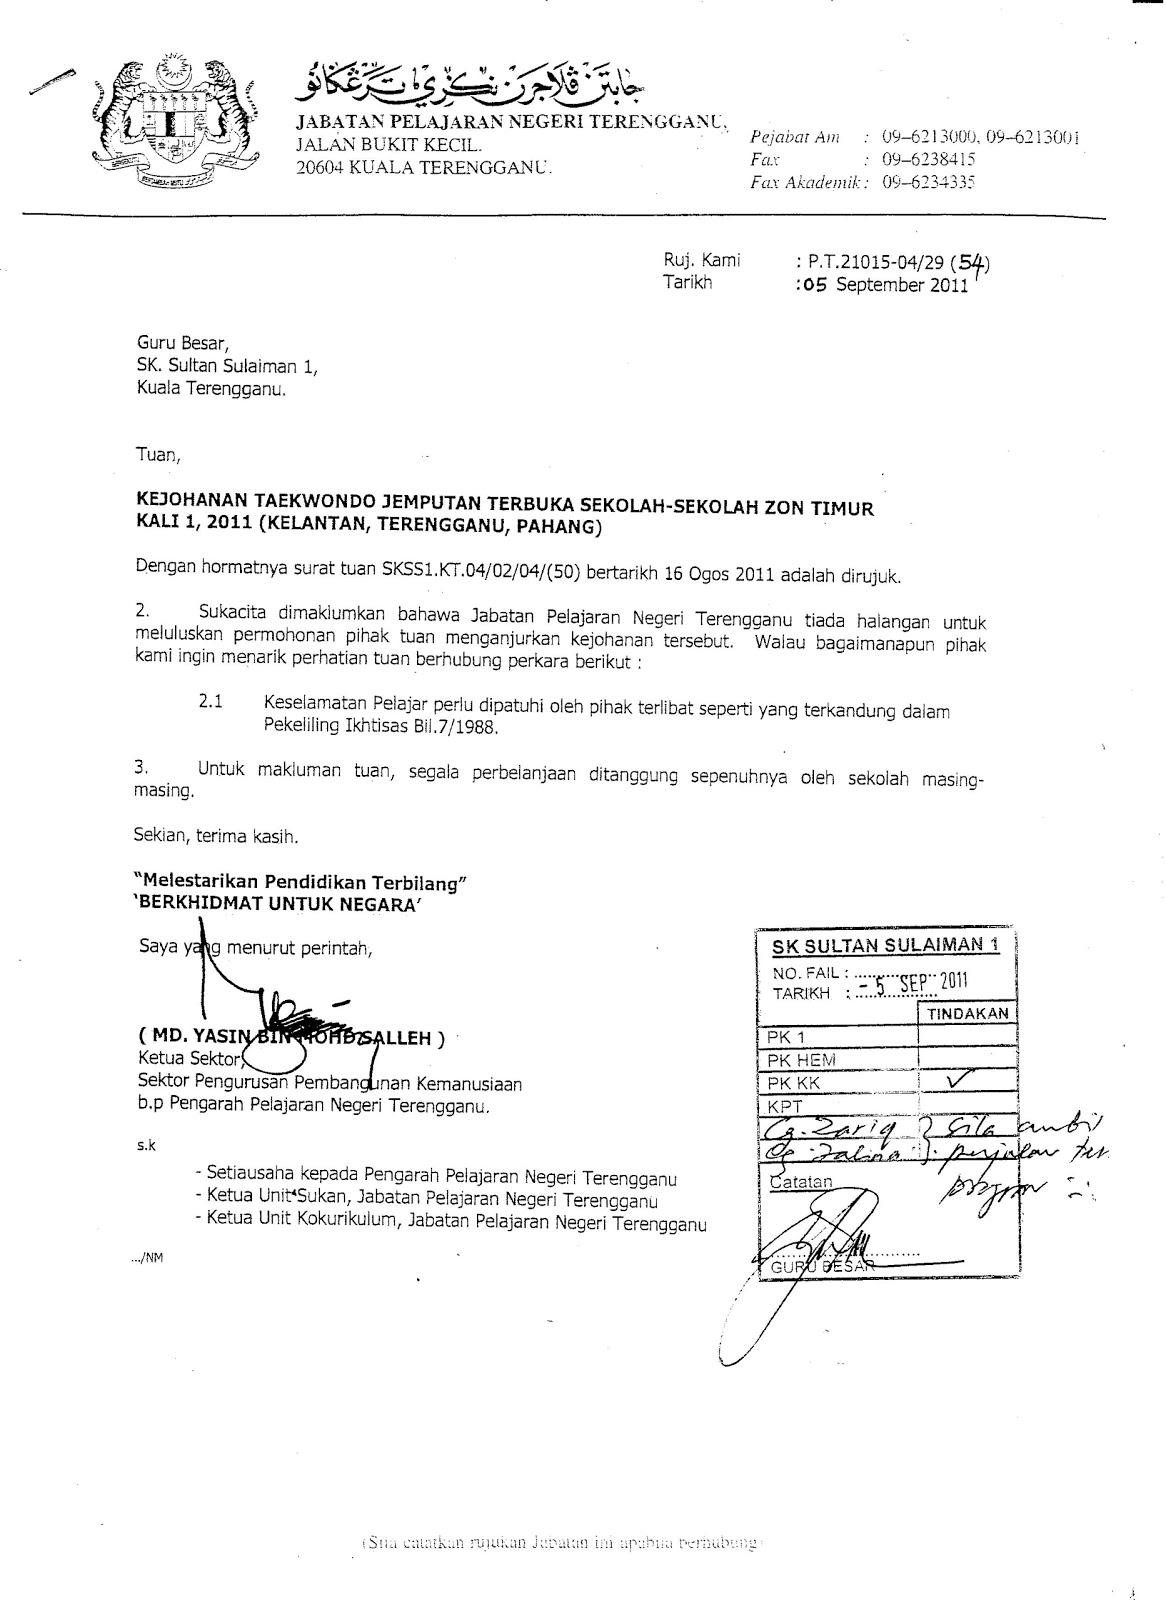 contoh format surat jemputan rasmi zentoh